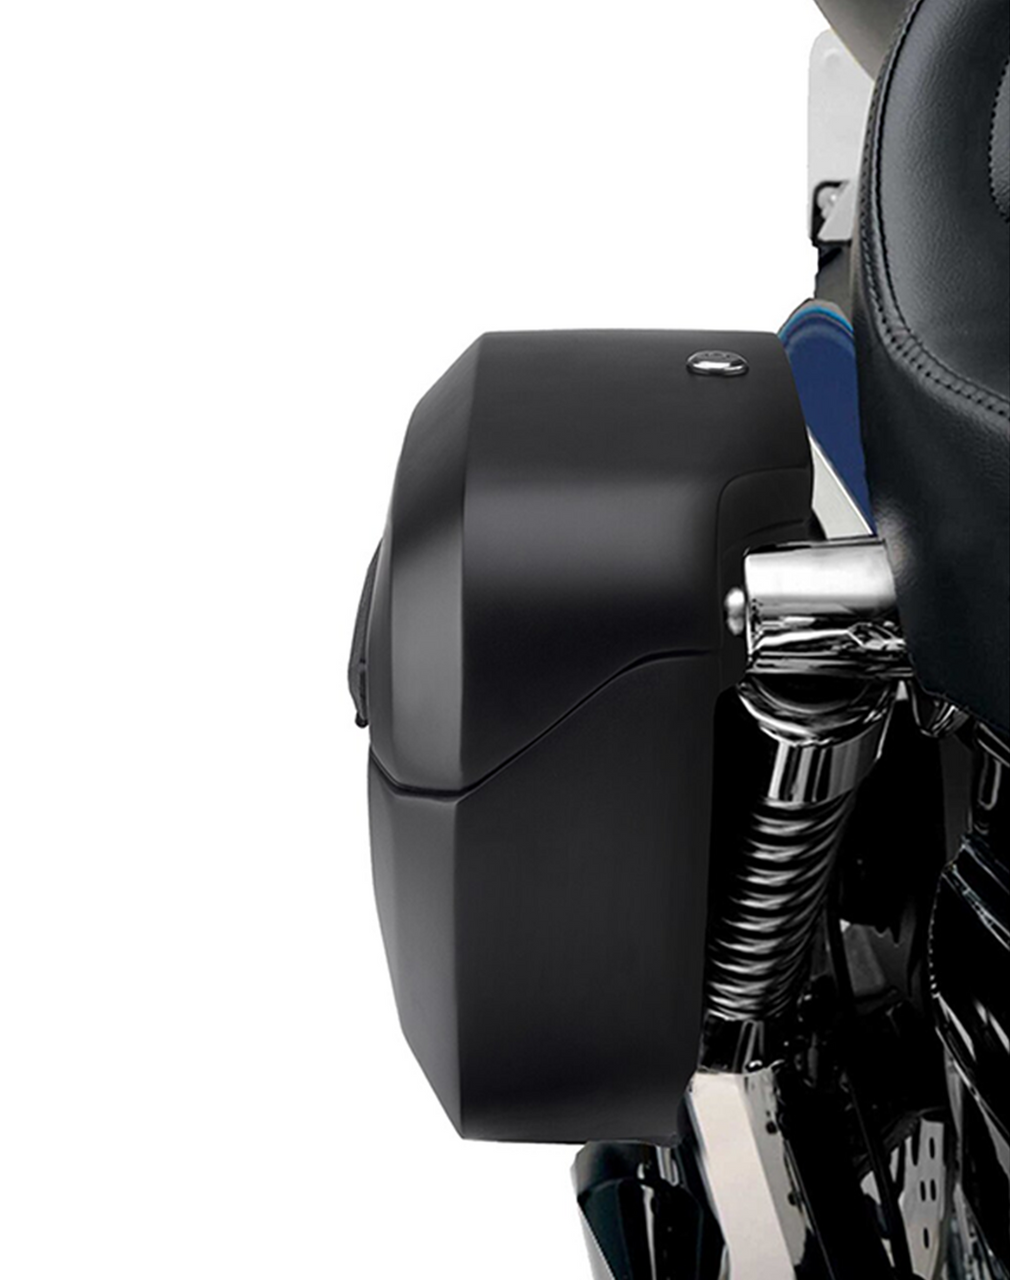 VikingBags Lamellar Large Shock Cutout Honda Shadow Aero ABS VT750CS Matte Motorcycle Hard Saddlebags Shock Cutout View